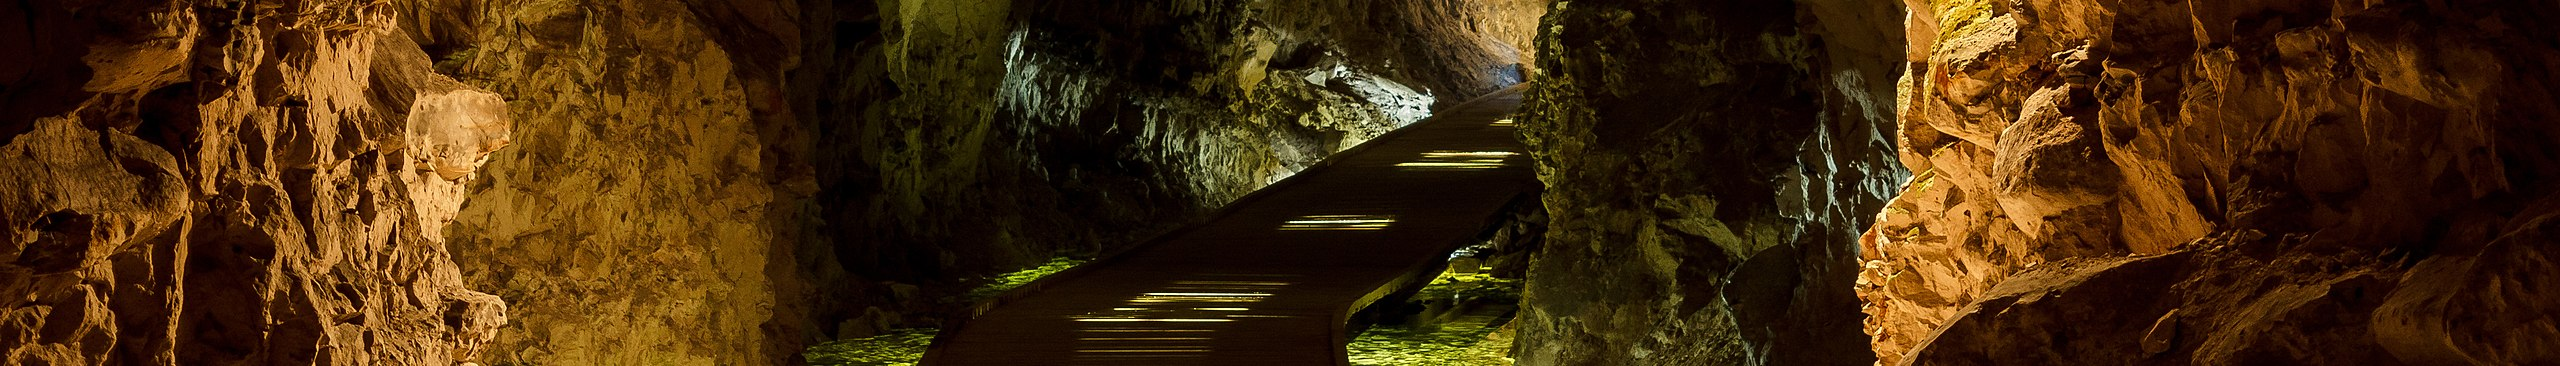 Mining tourism – Travel guide at Wikivoyage